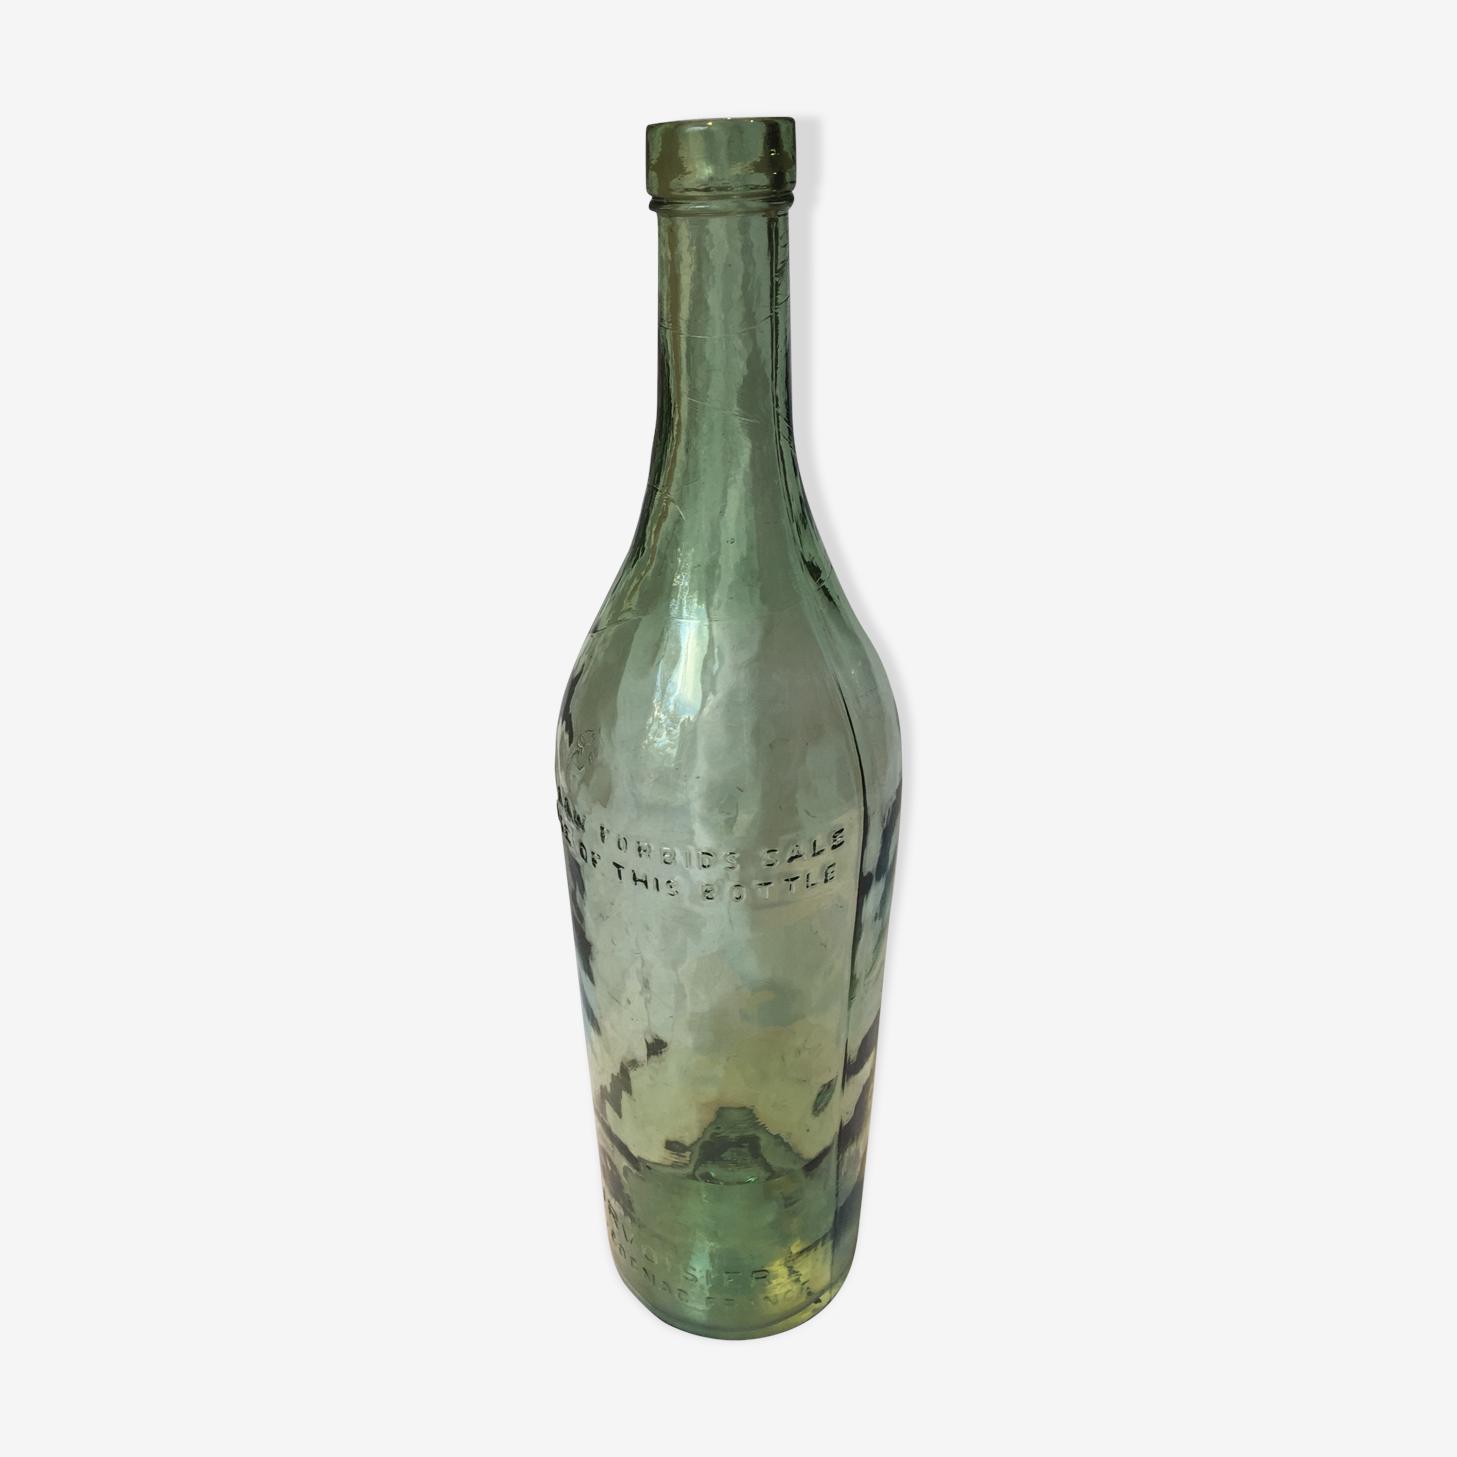 Bottle of cognac 4l - height 54 cm